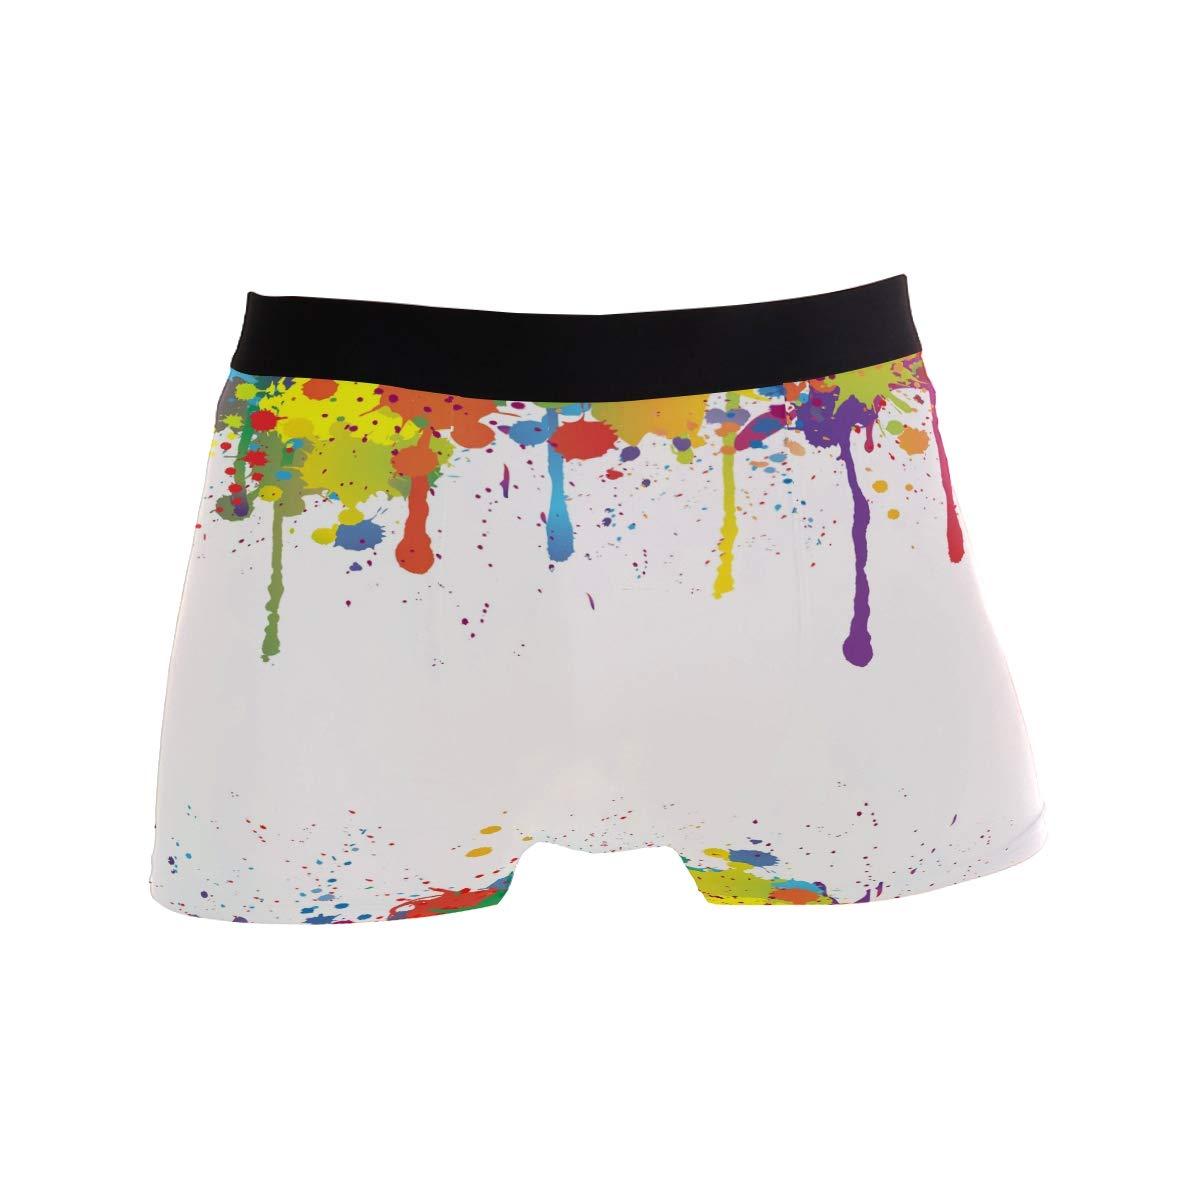 Colorful Ink Men/'s Boxer Briefs Underwear Stretchable S-XL